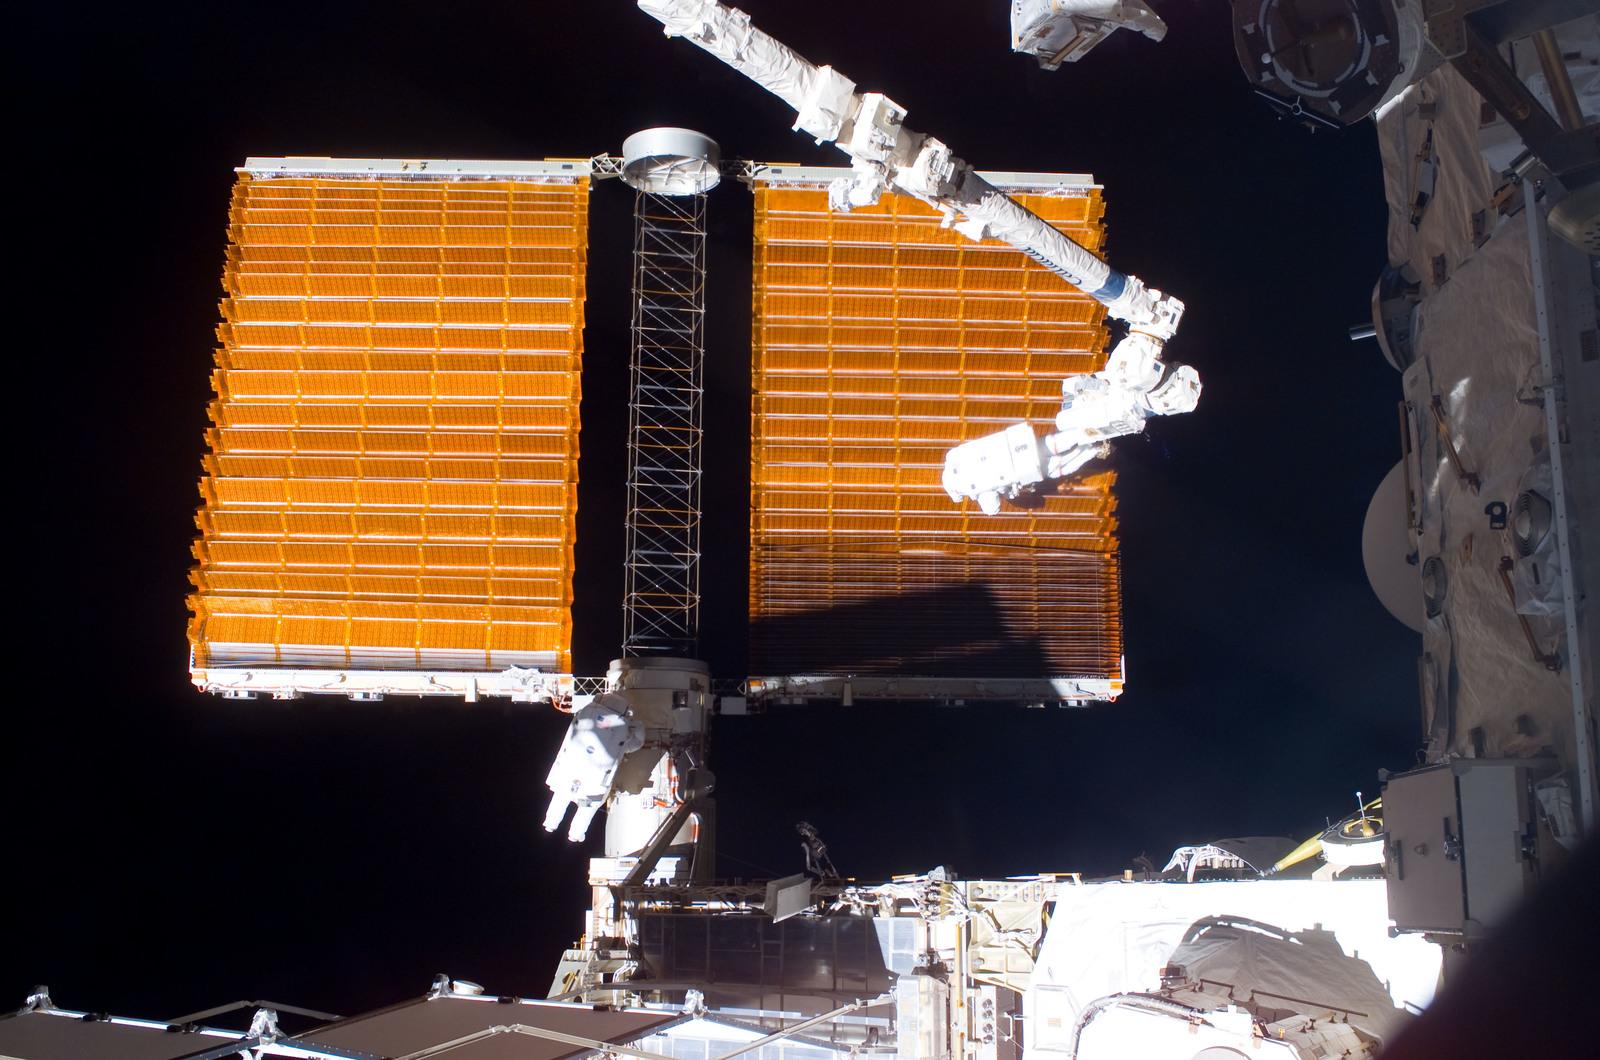 S116E06855 - STS-116 - STS-116 MS Fuglesang and Curbeam,Jr.,during EVA 4